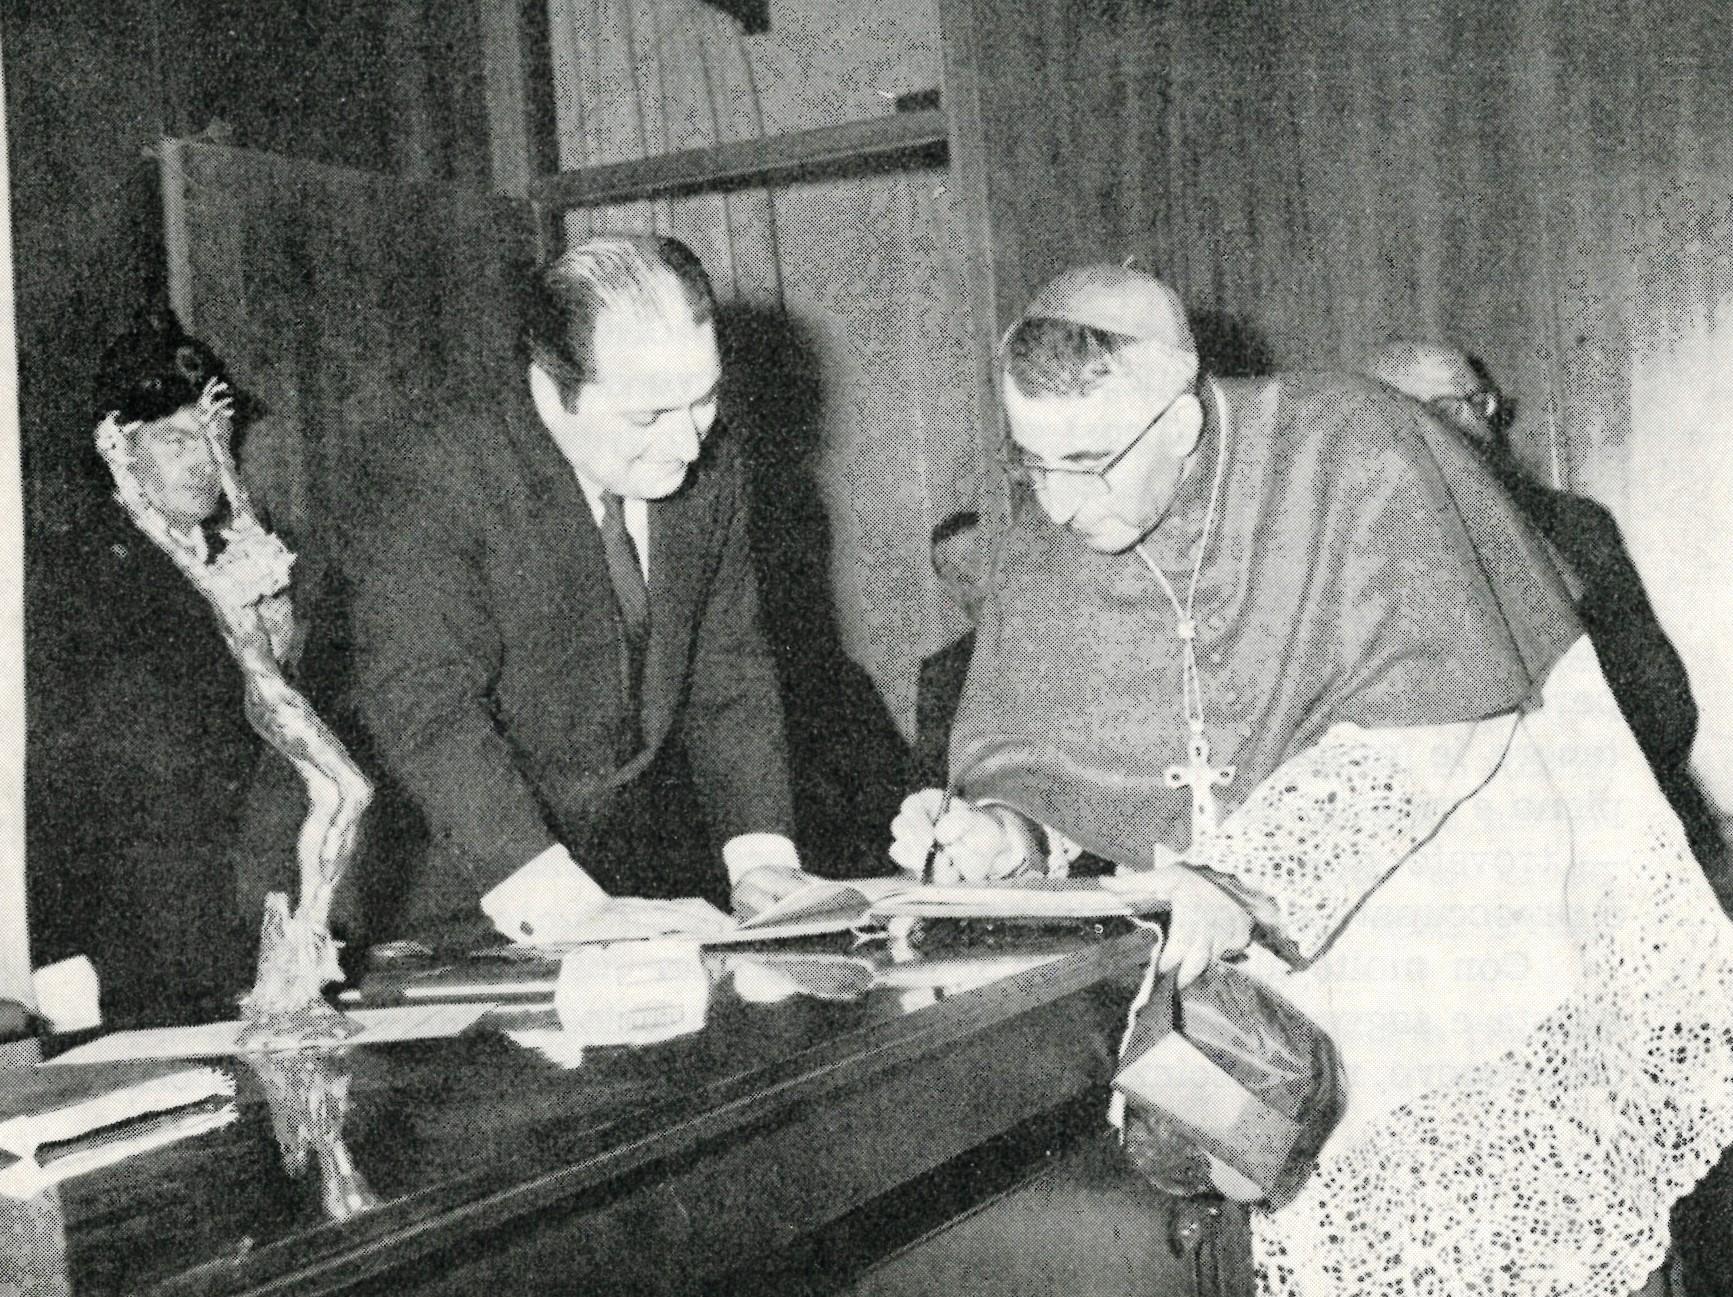 1970 cittadinanza onoraria